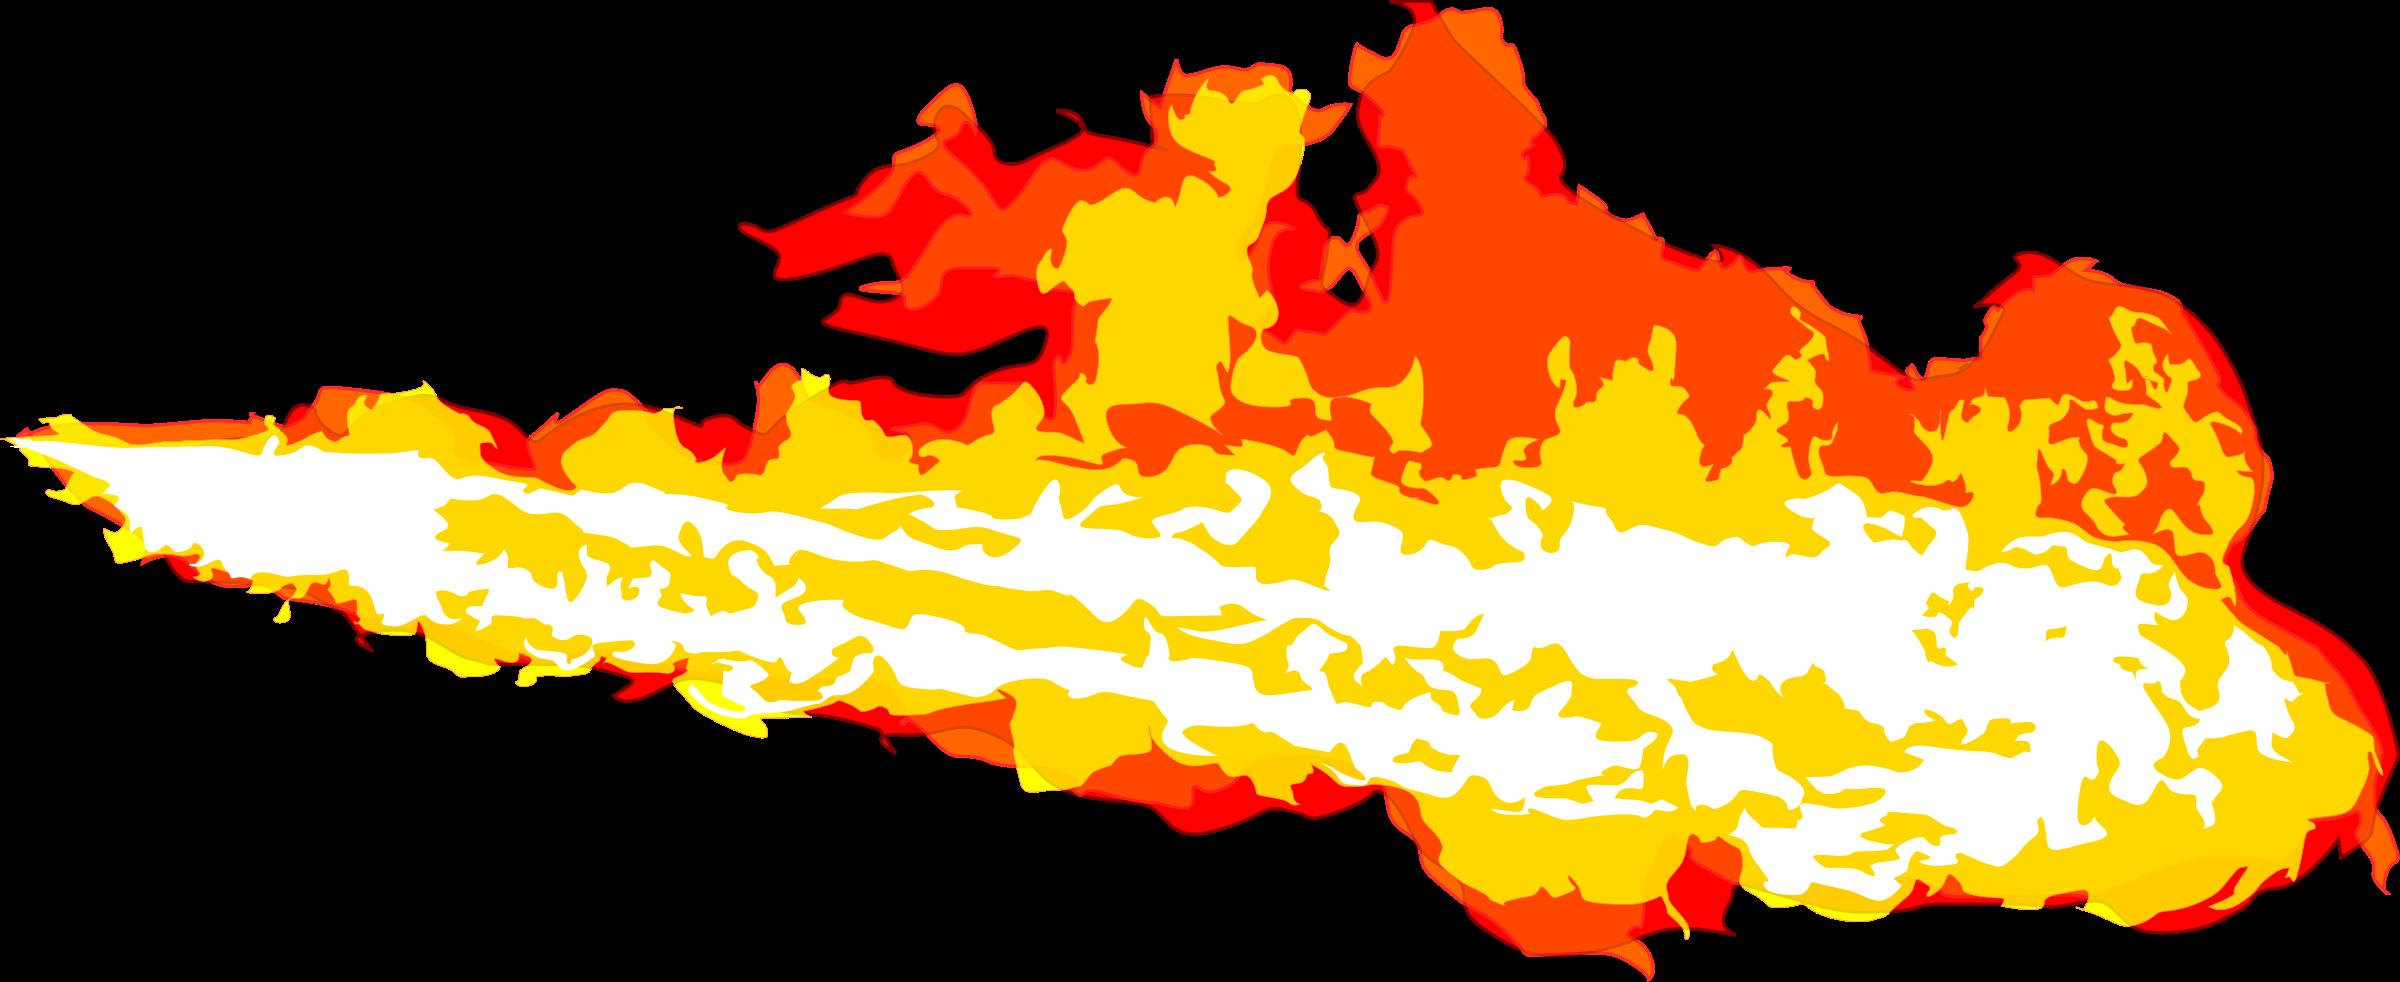 Flamethrower stream big image. Explosion clipart fiery